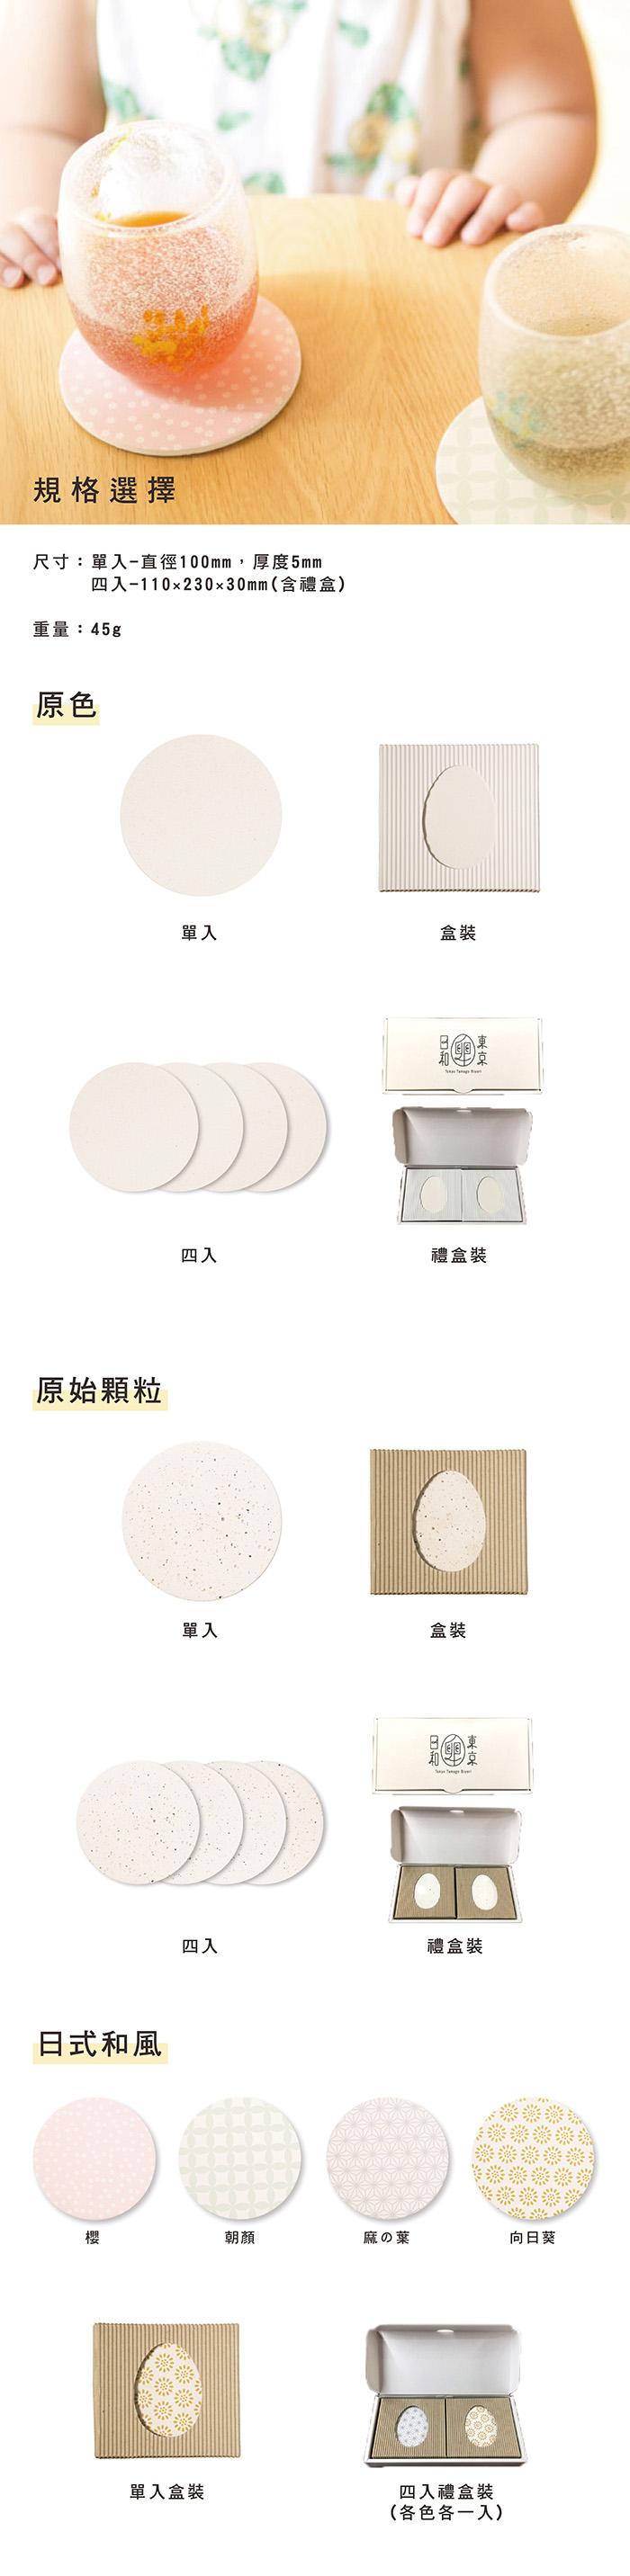 UFUFU 強力吸水蛋殼防滑杯墊(四入禮盒裝)